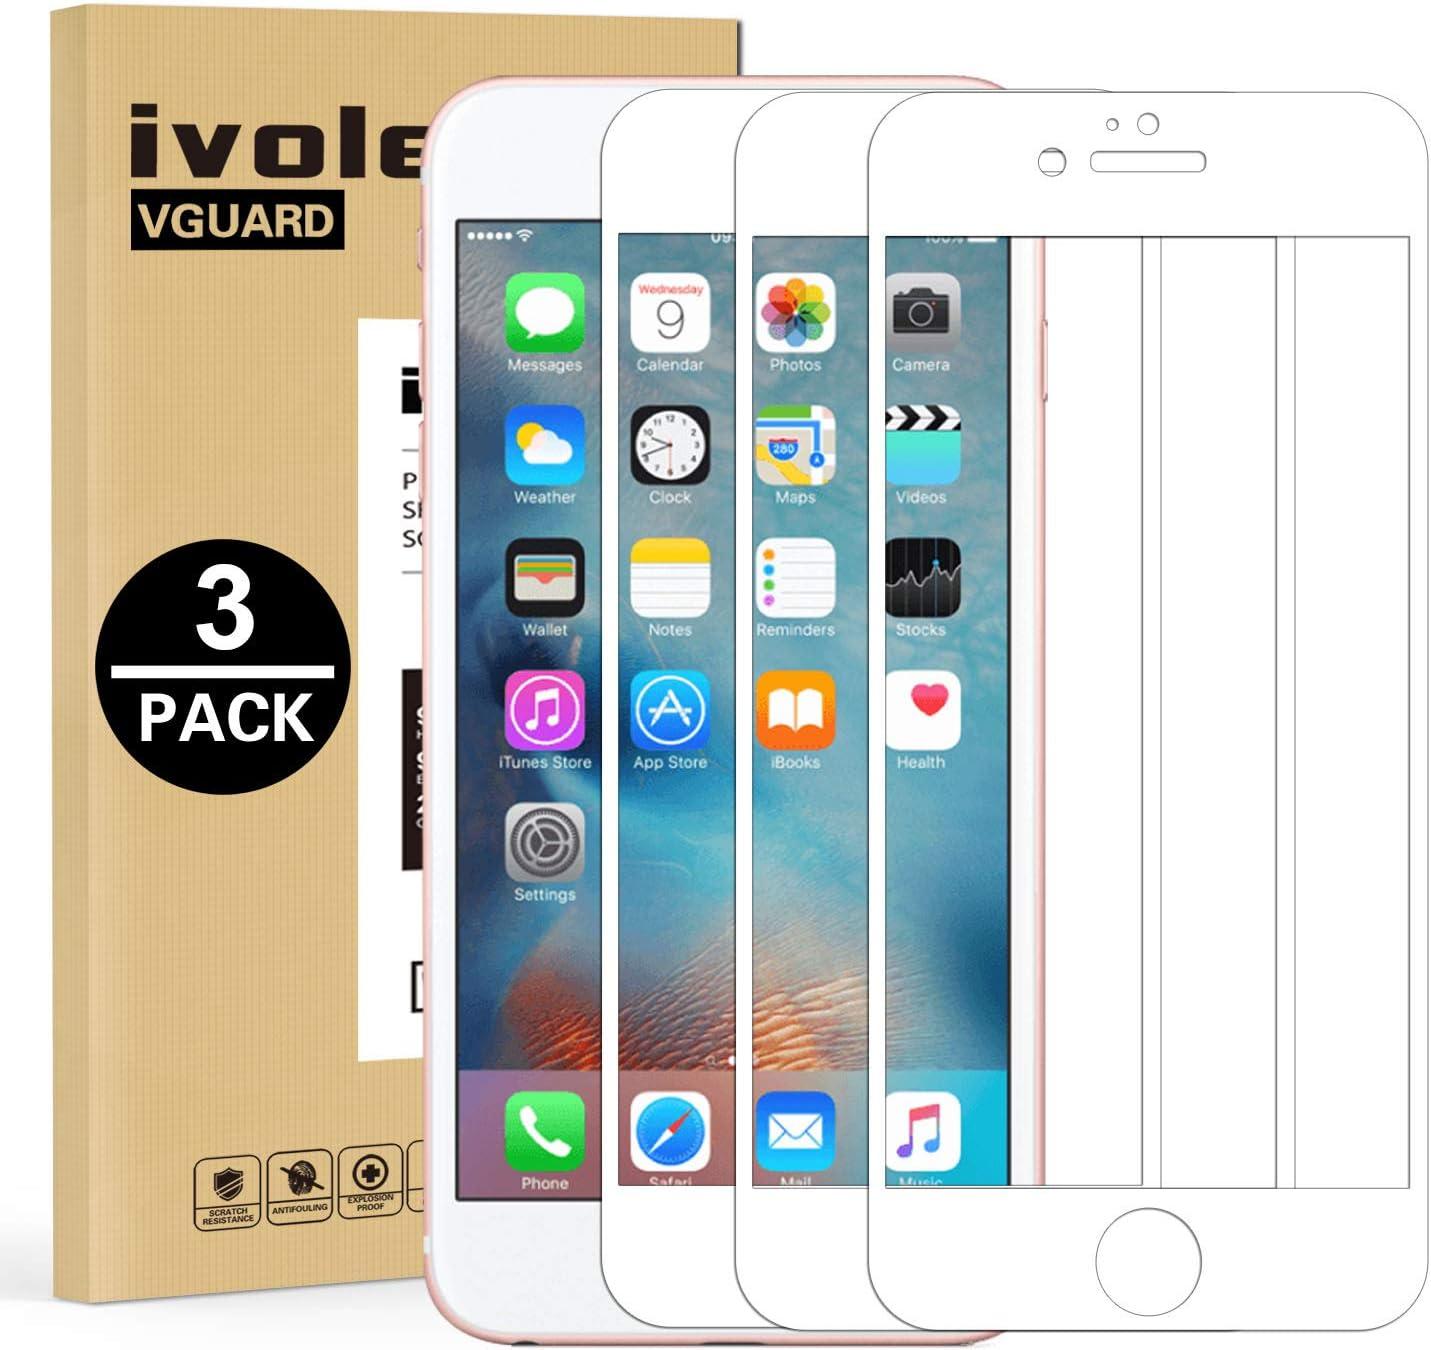 ivoler 3 Unidades Protector de Pantalla para iPhone 6S Plus/iPhone 6 Plus, [Cobertura Completa] Cristal Vidrio Templado Premium, [Dureza 9H] [Anti-Arañazos] [Sin Burbujas] - Blanco